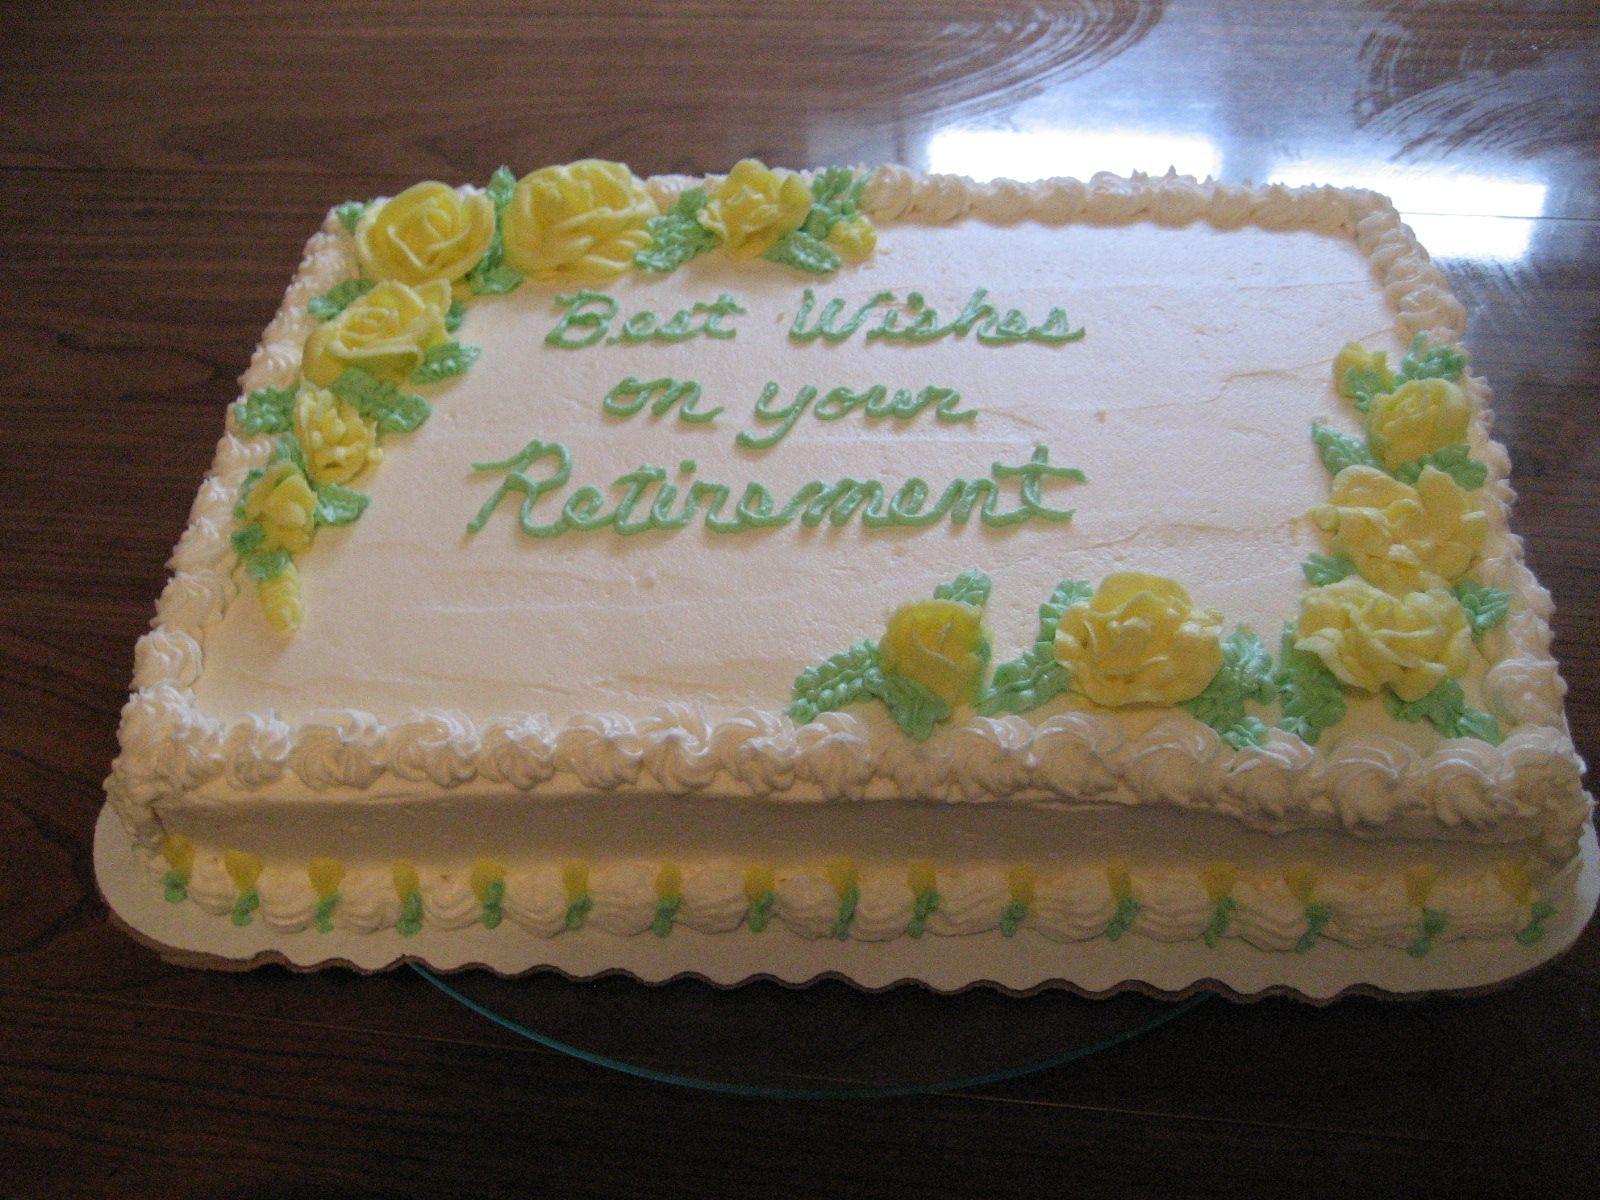 Retirement Yellow Roses Cakes